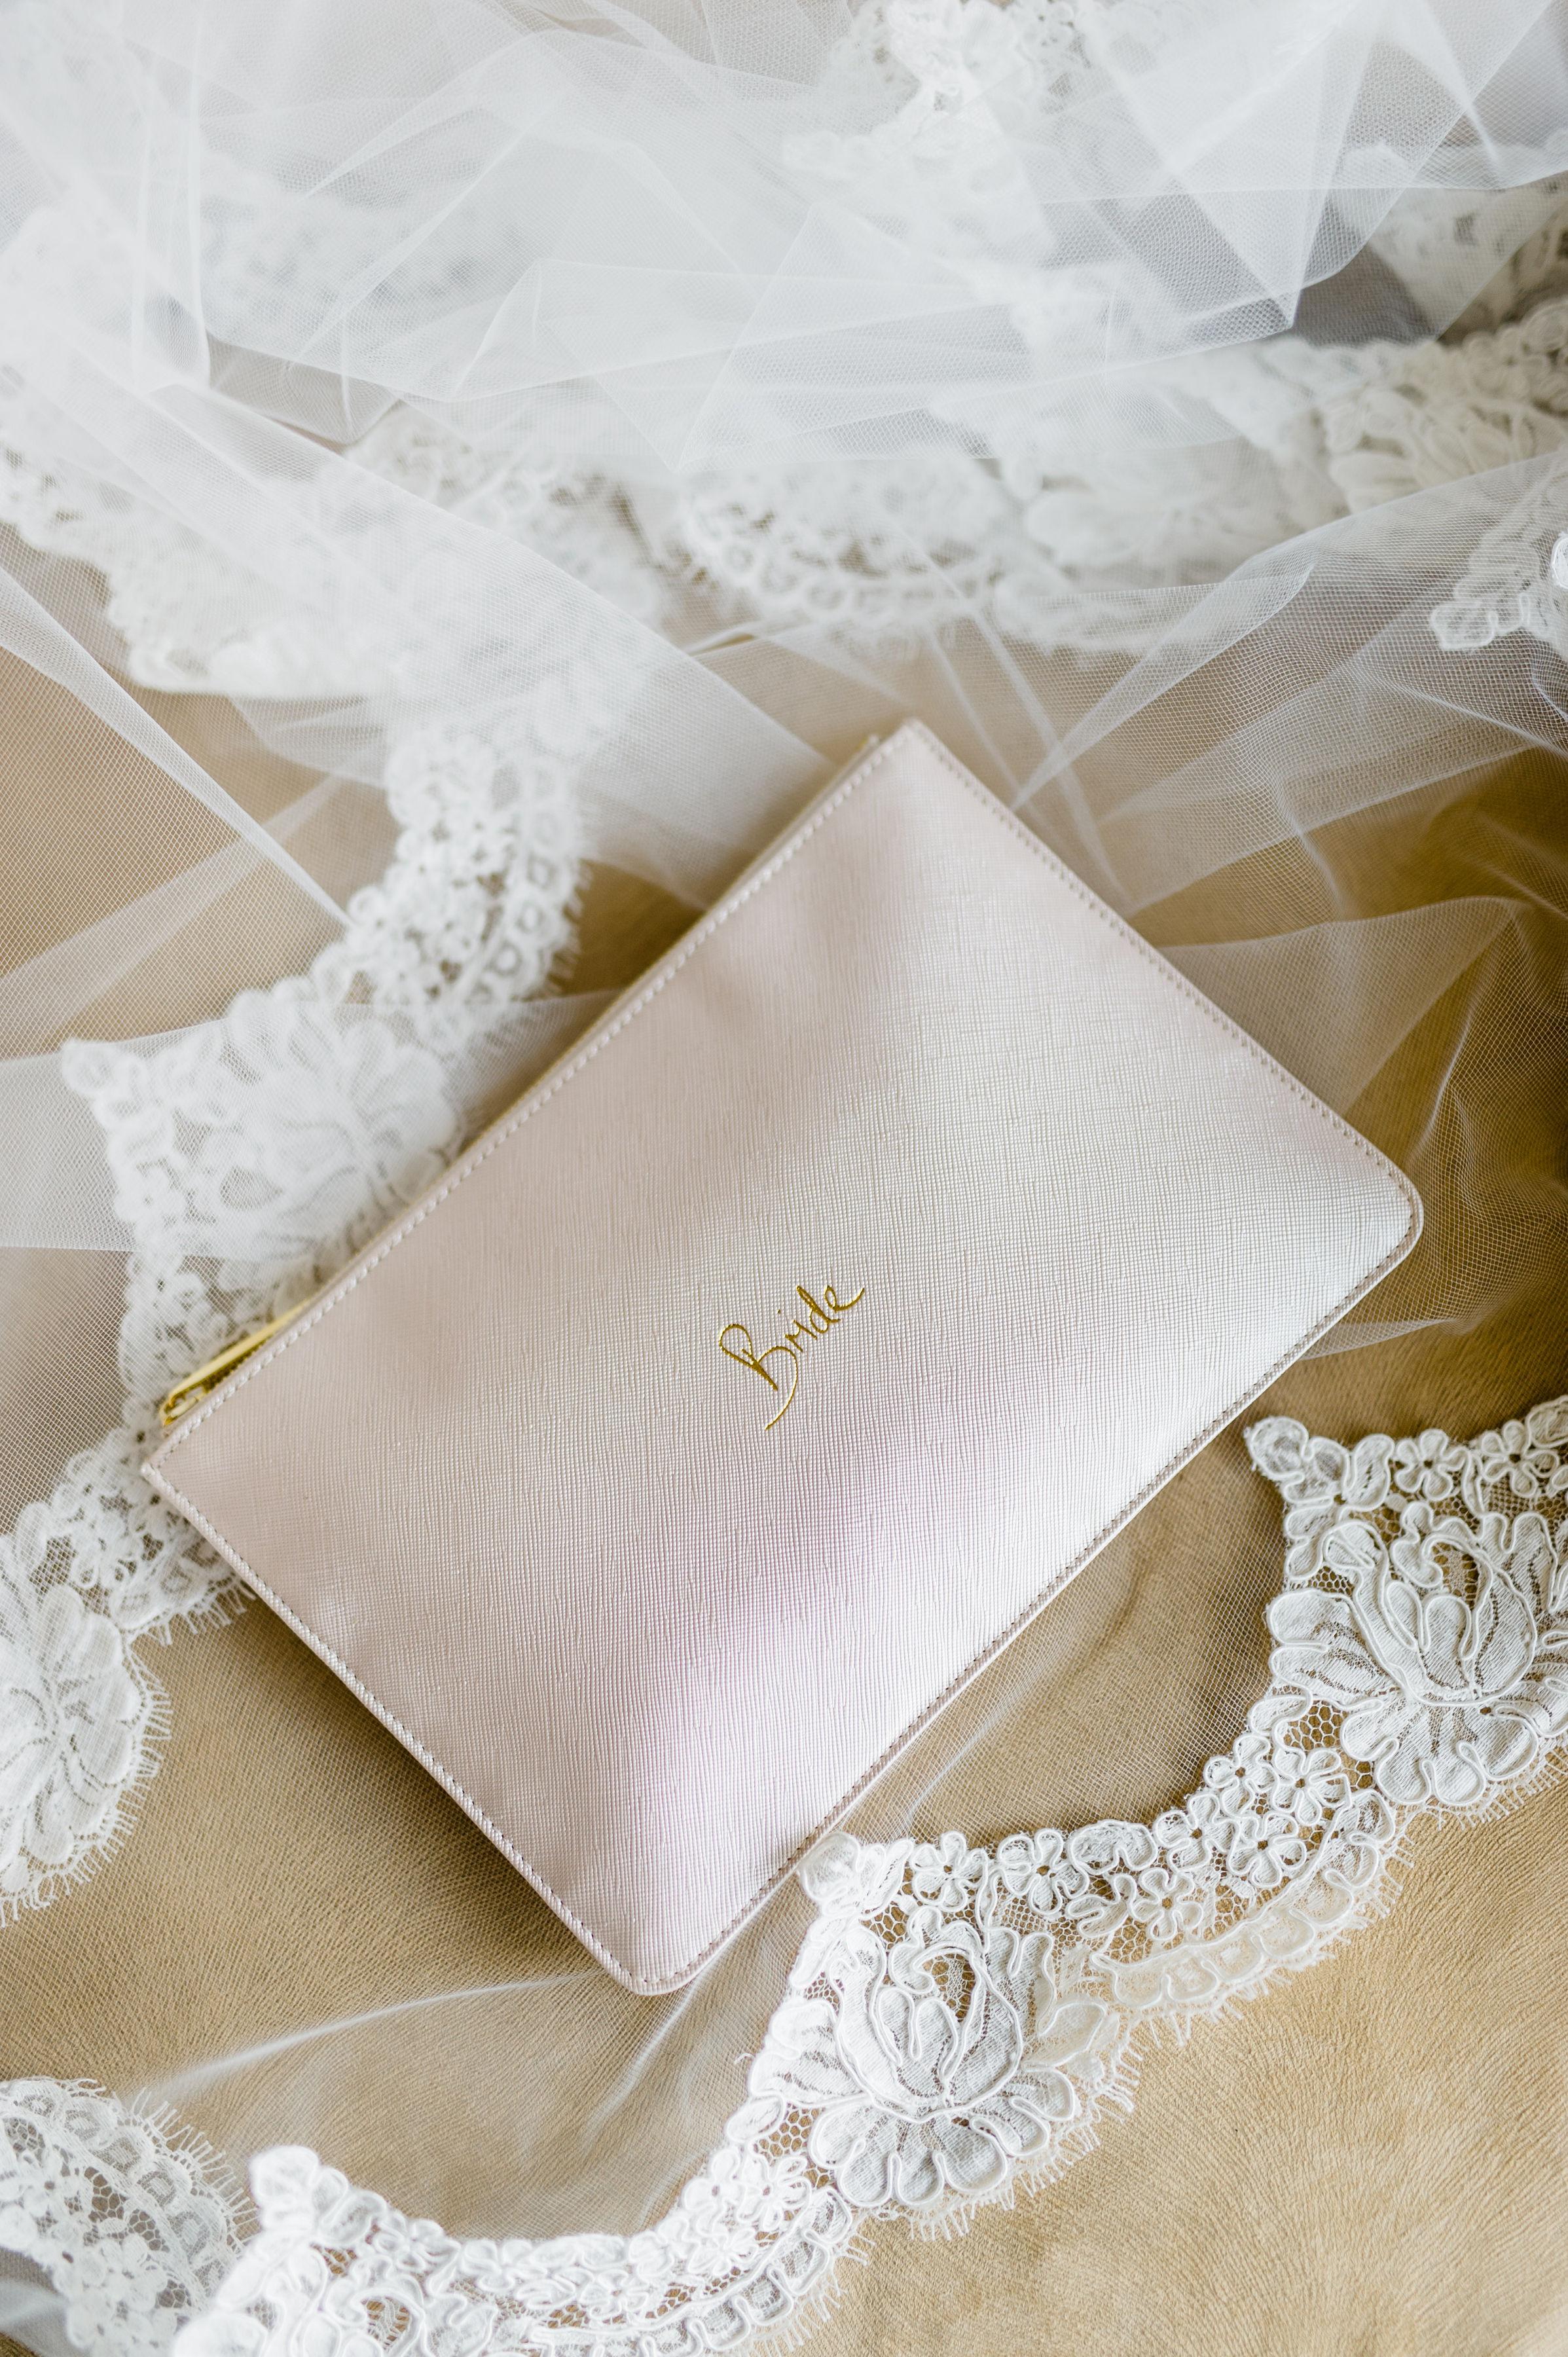 McElravey_Wedding_CarolineLimaPhotography_2018_045.jpg